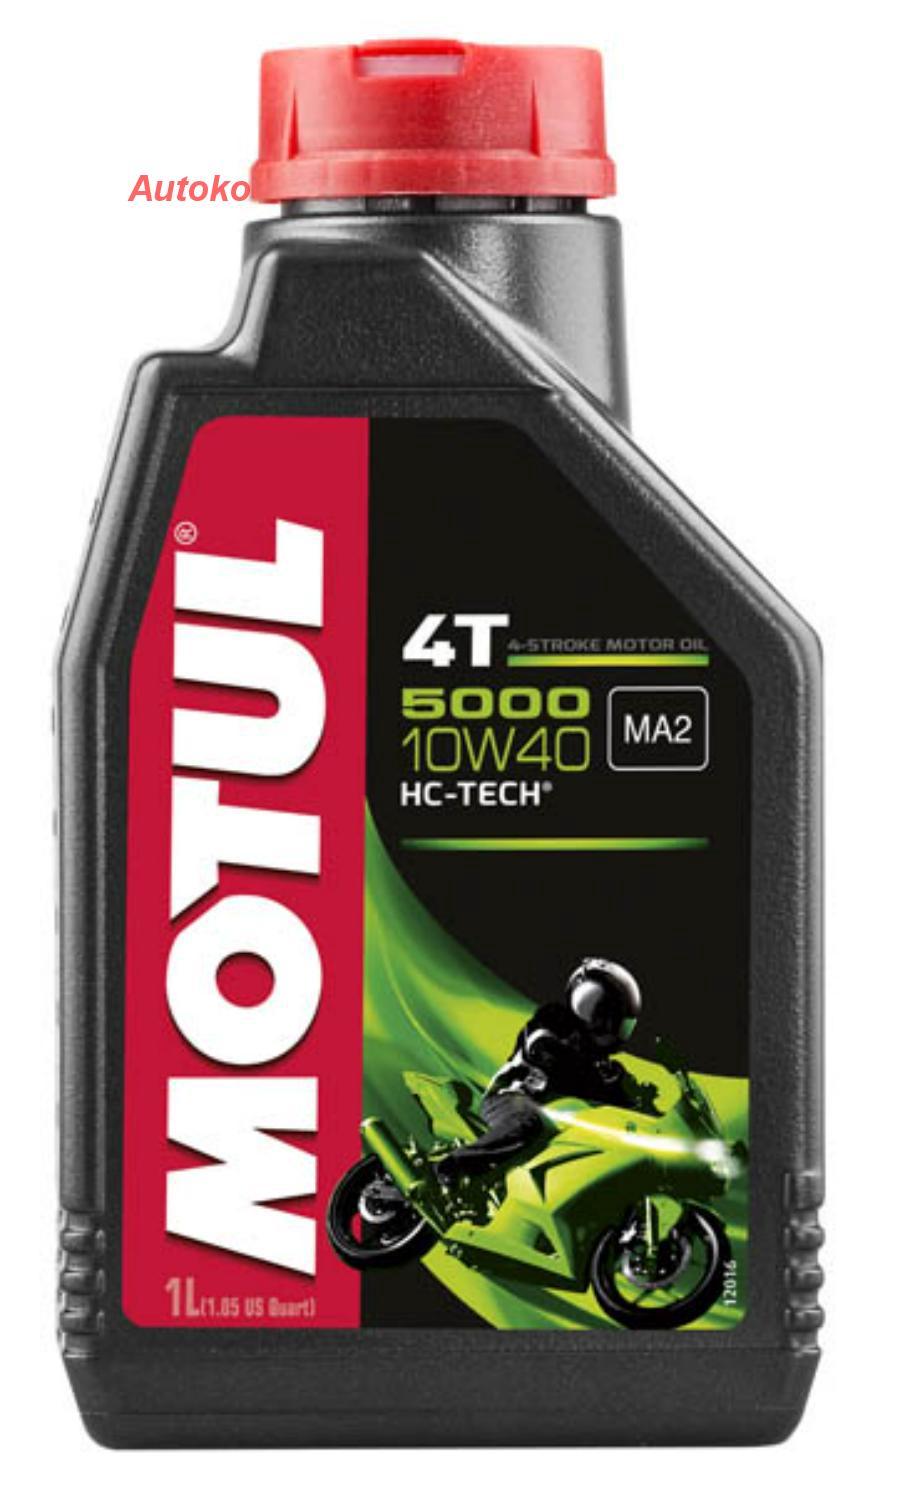 Масло моторное полусинтетическое 5000 HC-Tech 4T 10W-40, 1л